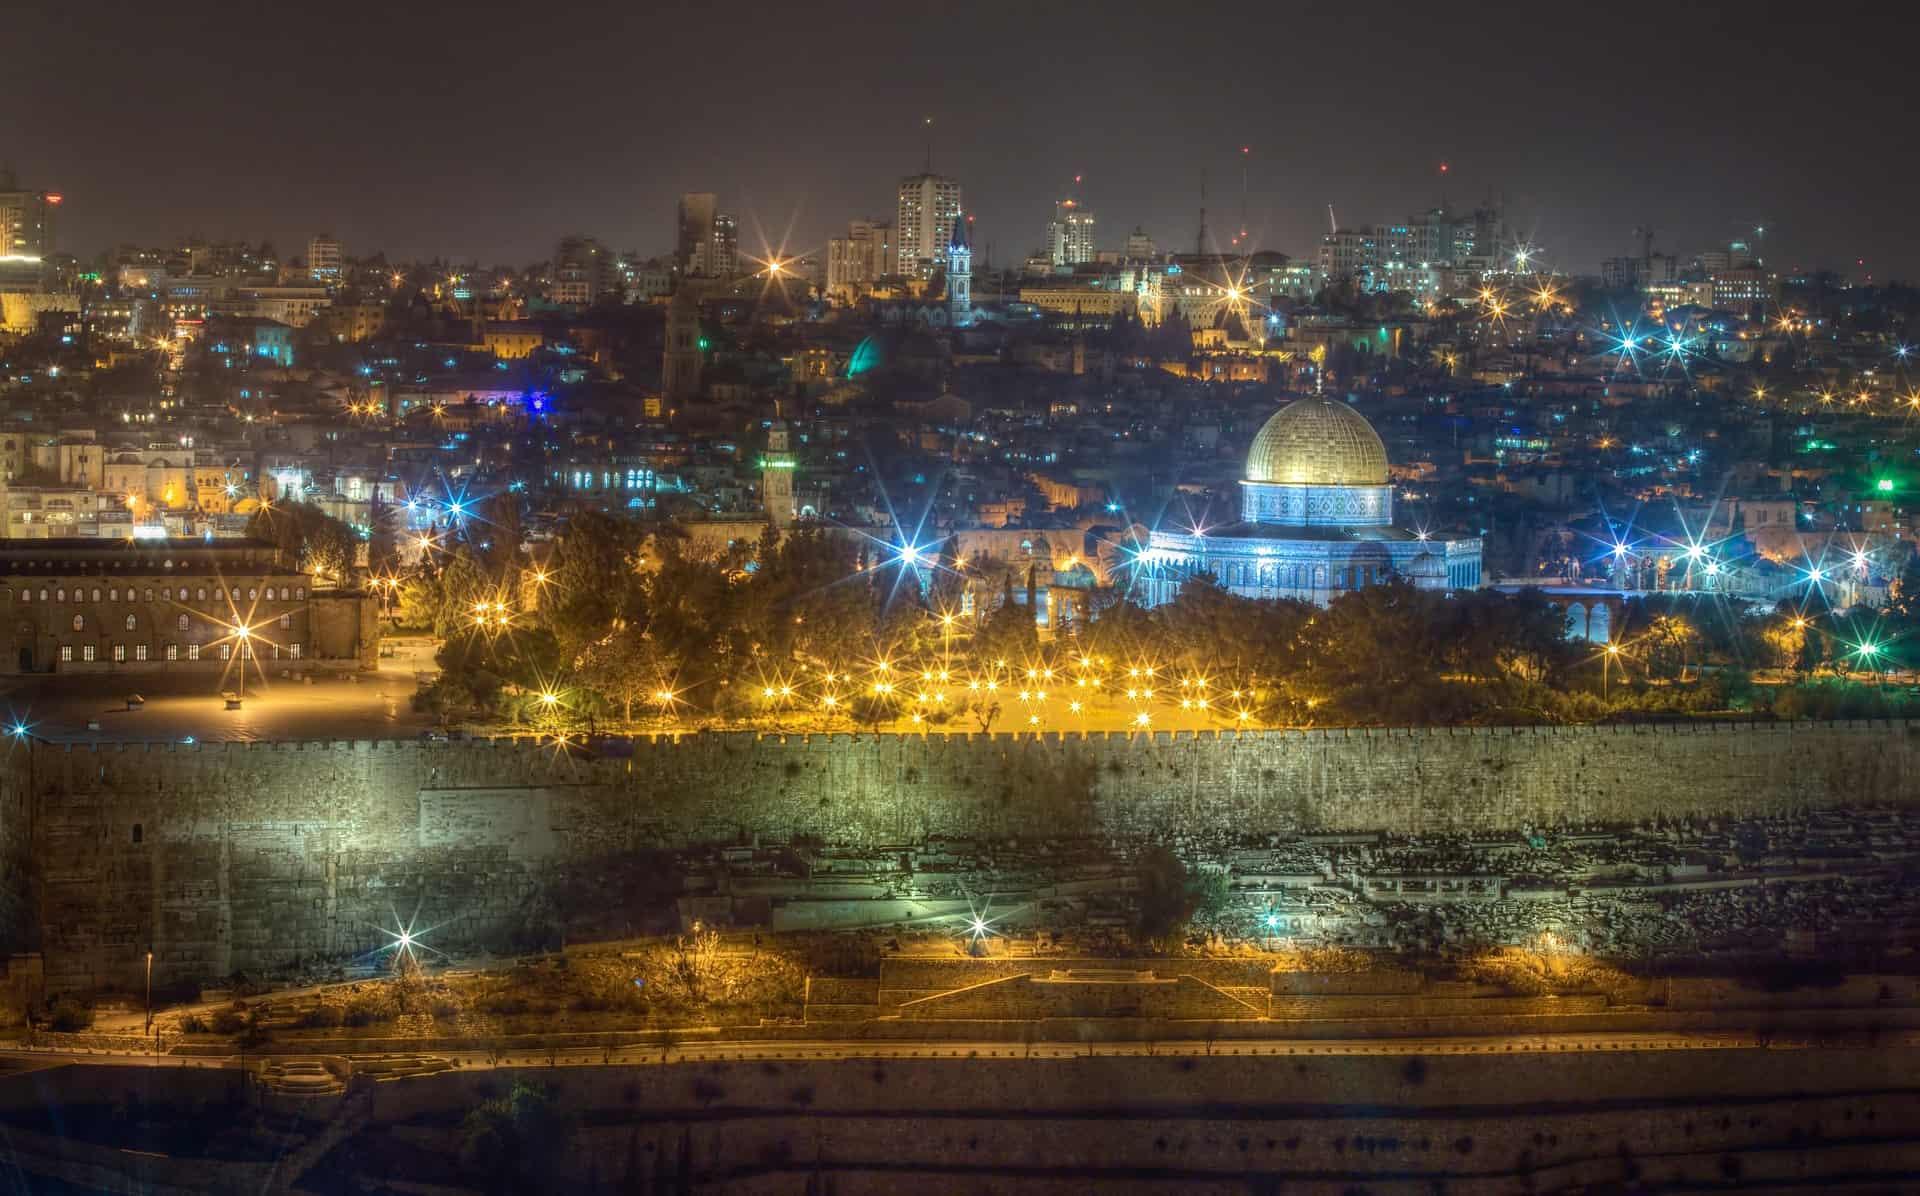 Bucket List Trip: Israel!